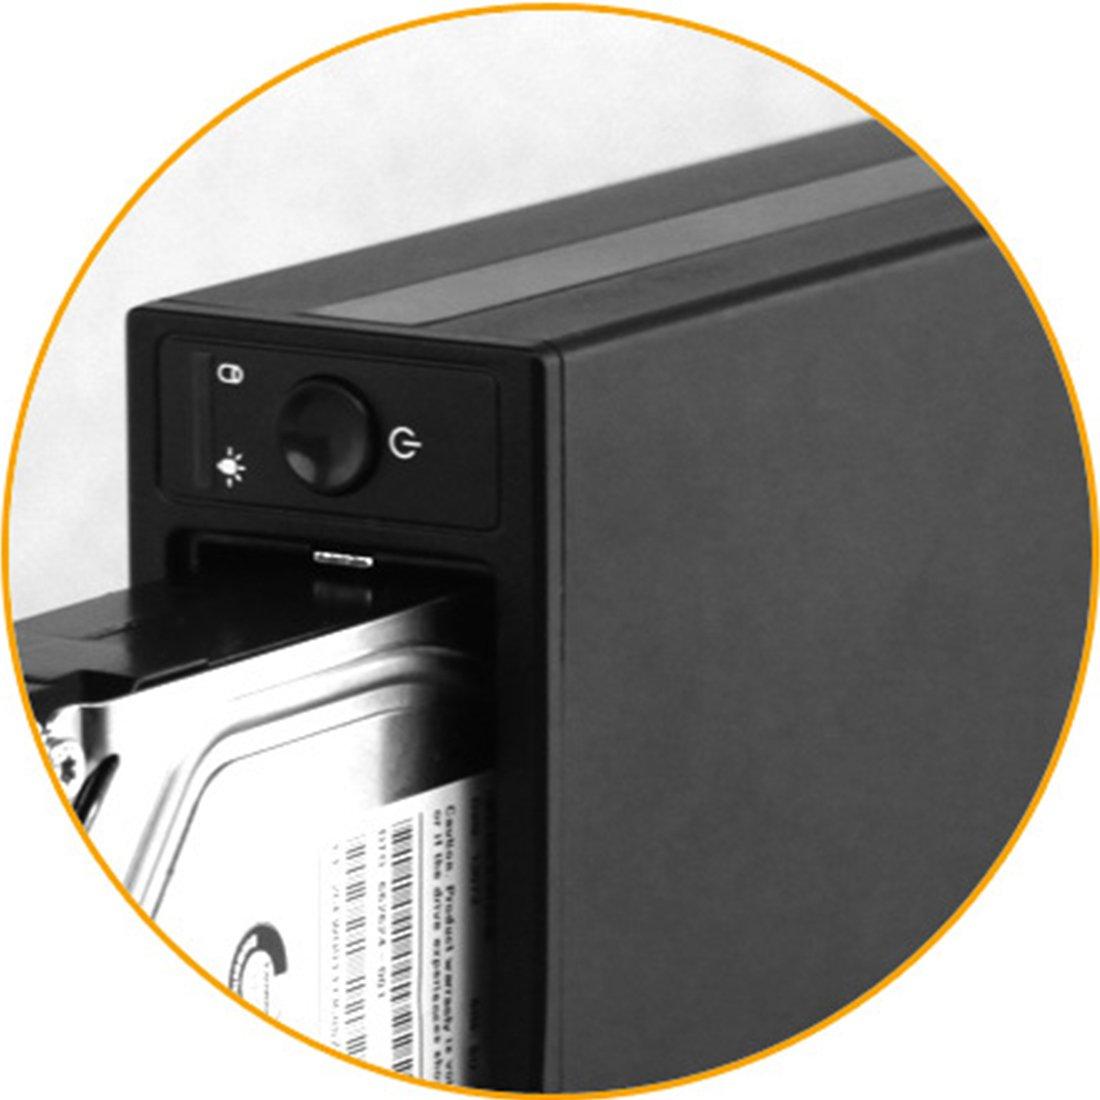 ToneStyle-U USB 3.0 Caja de Disco Duro Externo SATA DE 3.5 ...